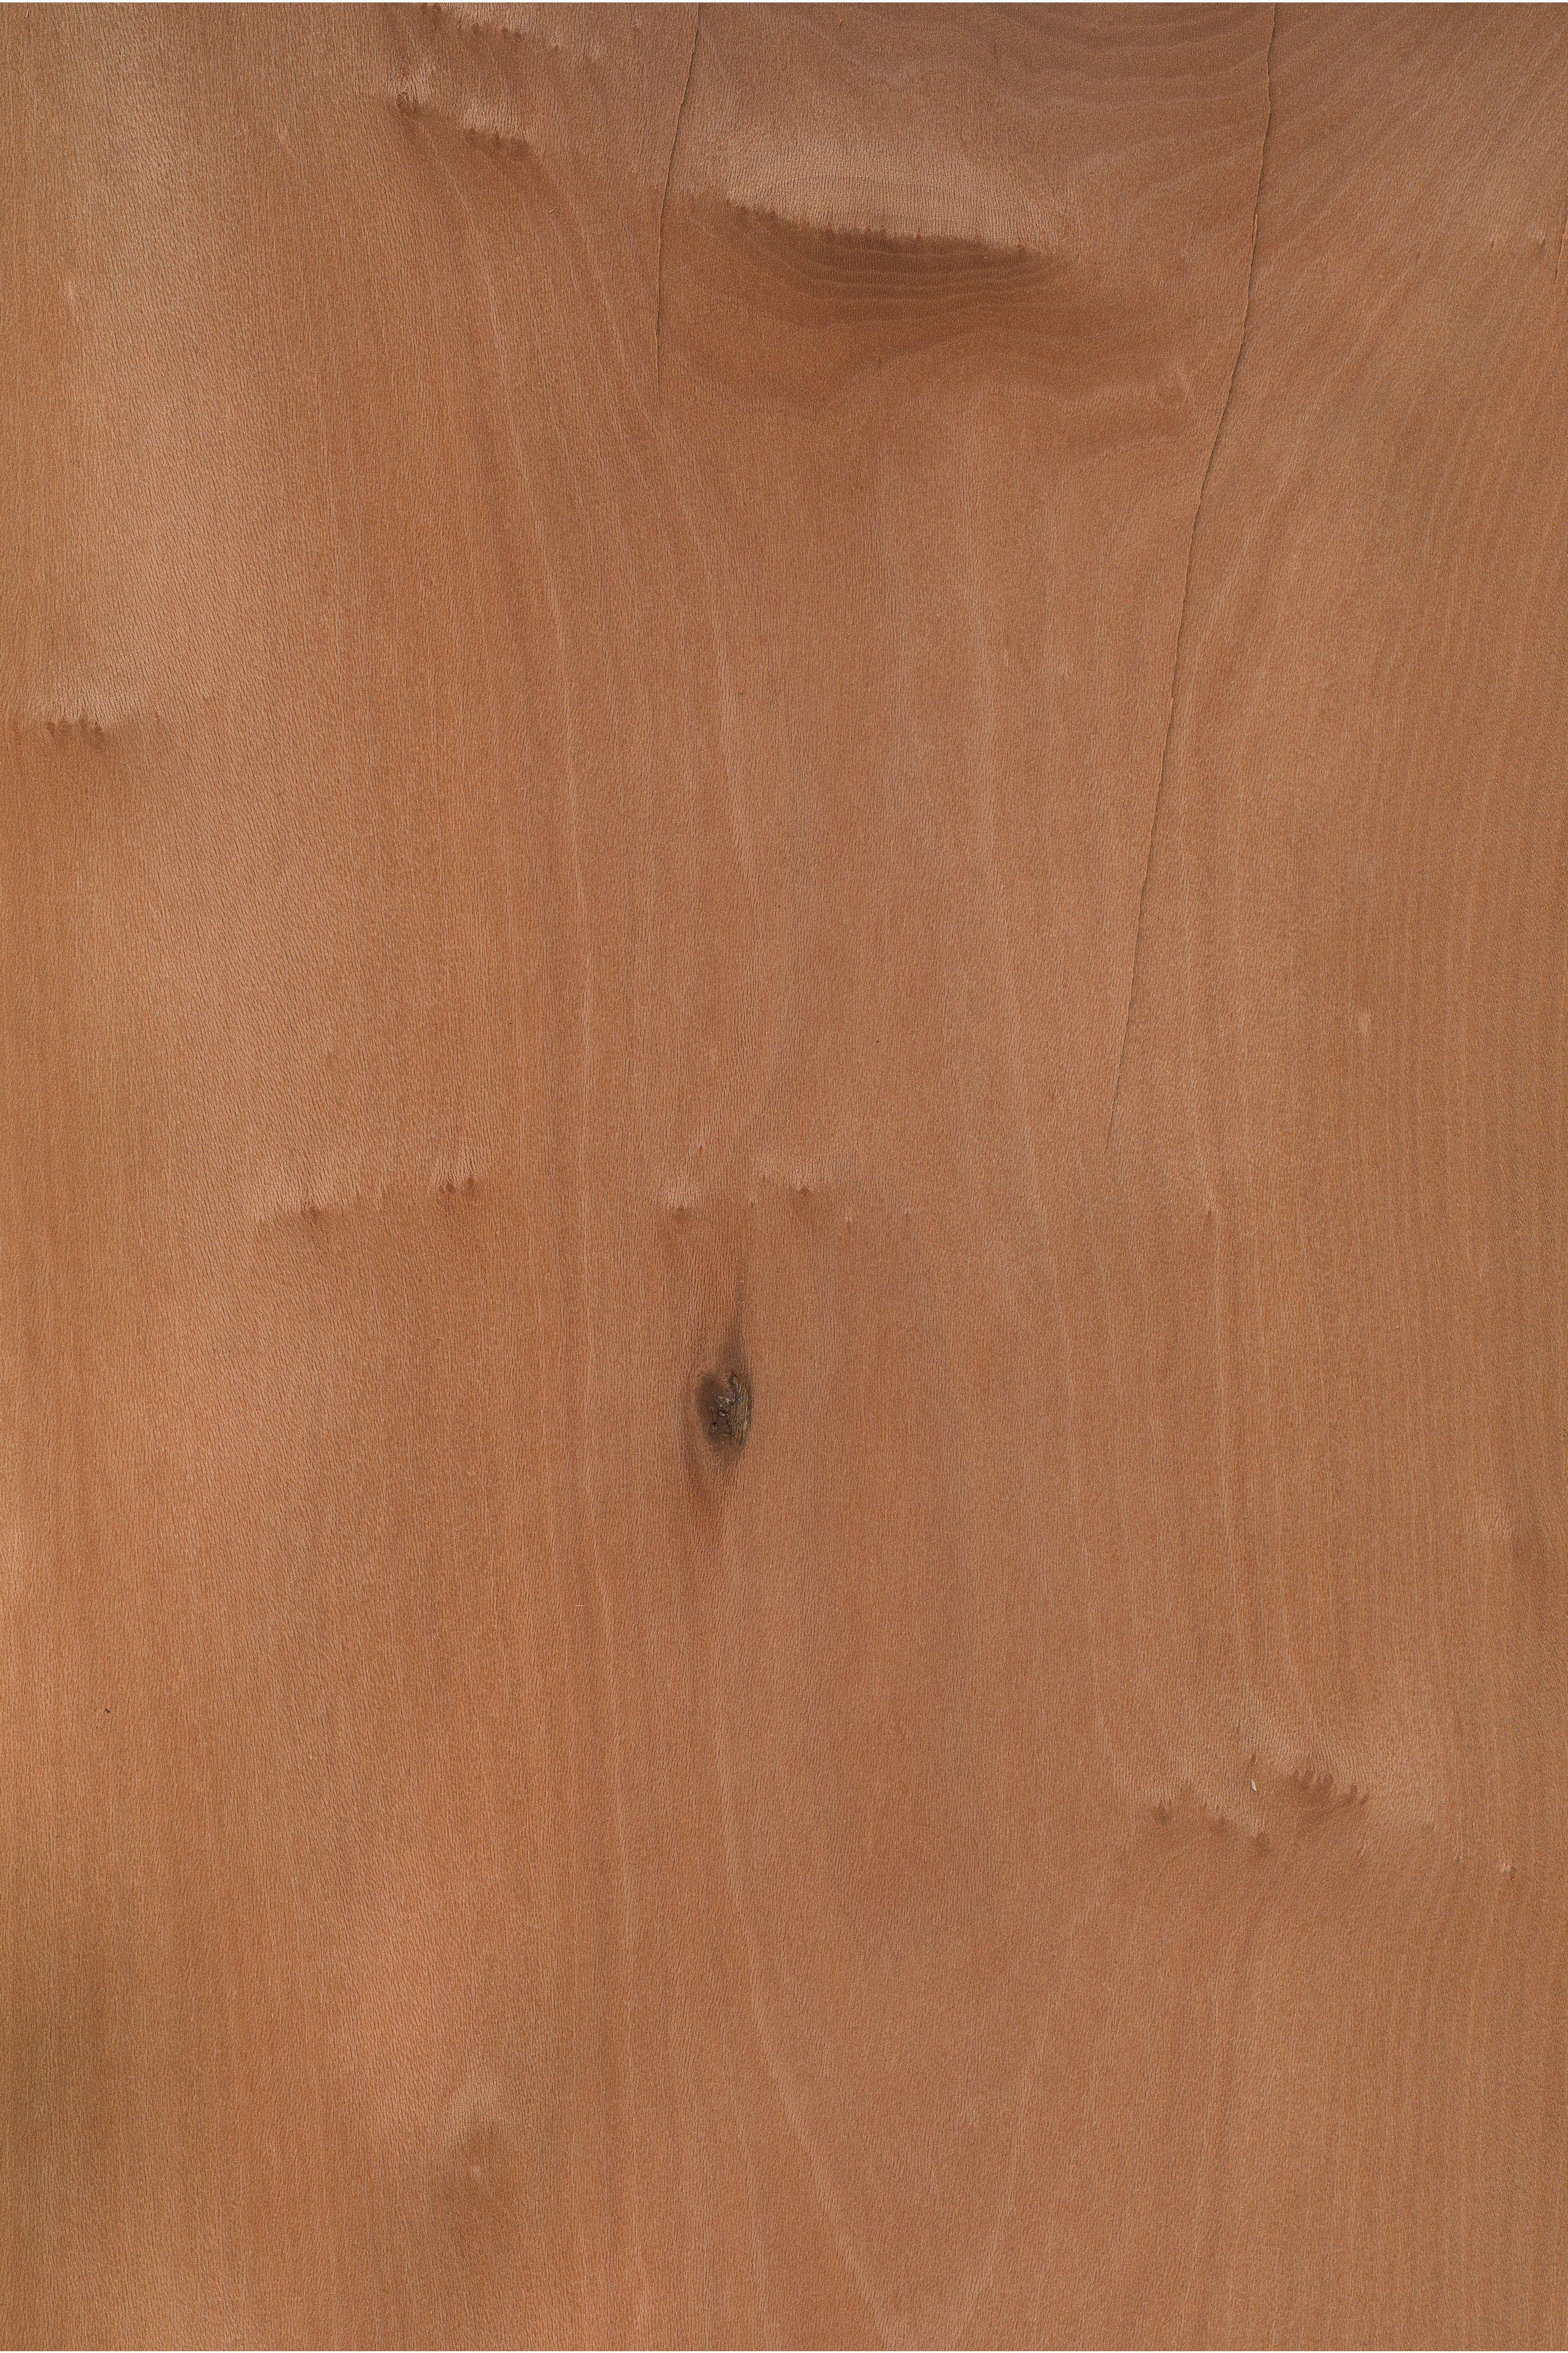 Platane | Furnier: Holzart, Platane, Blatt, rot, braun ...